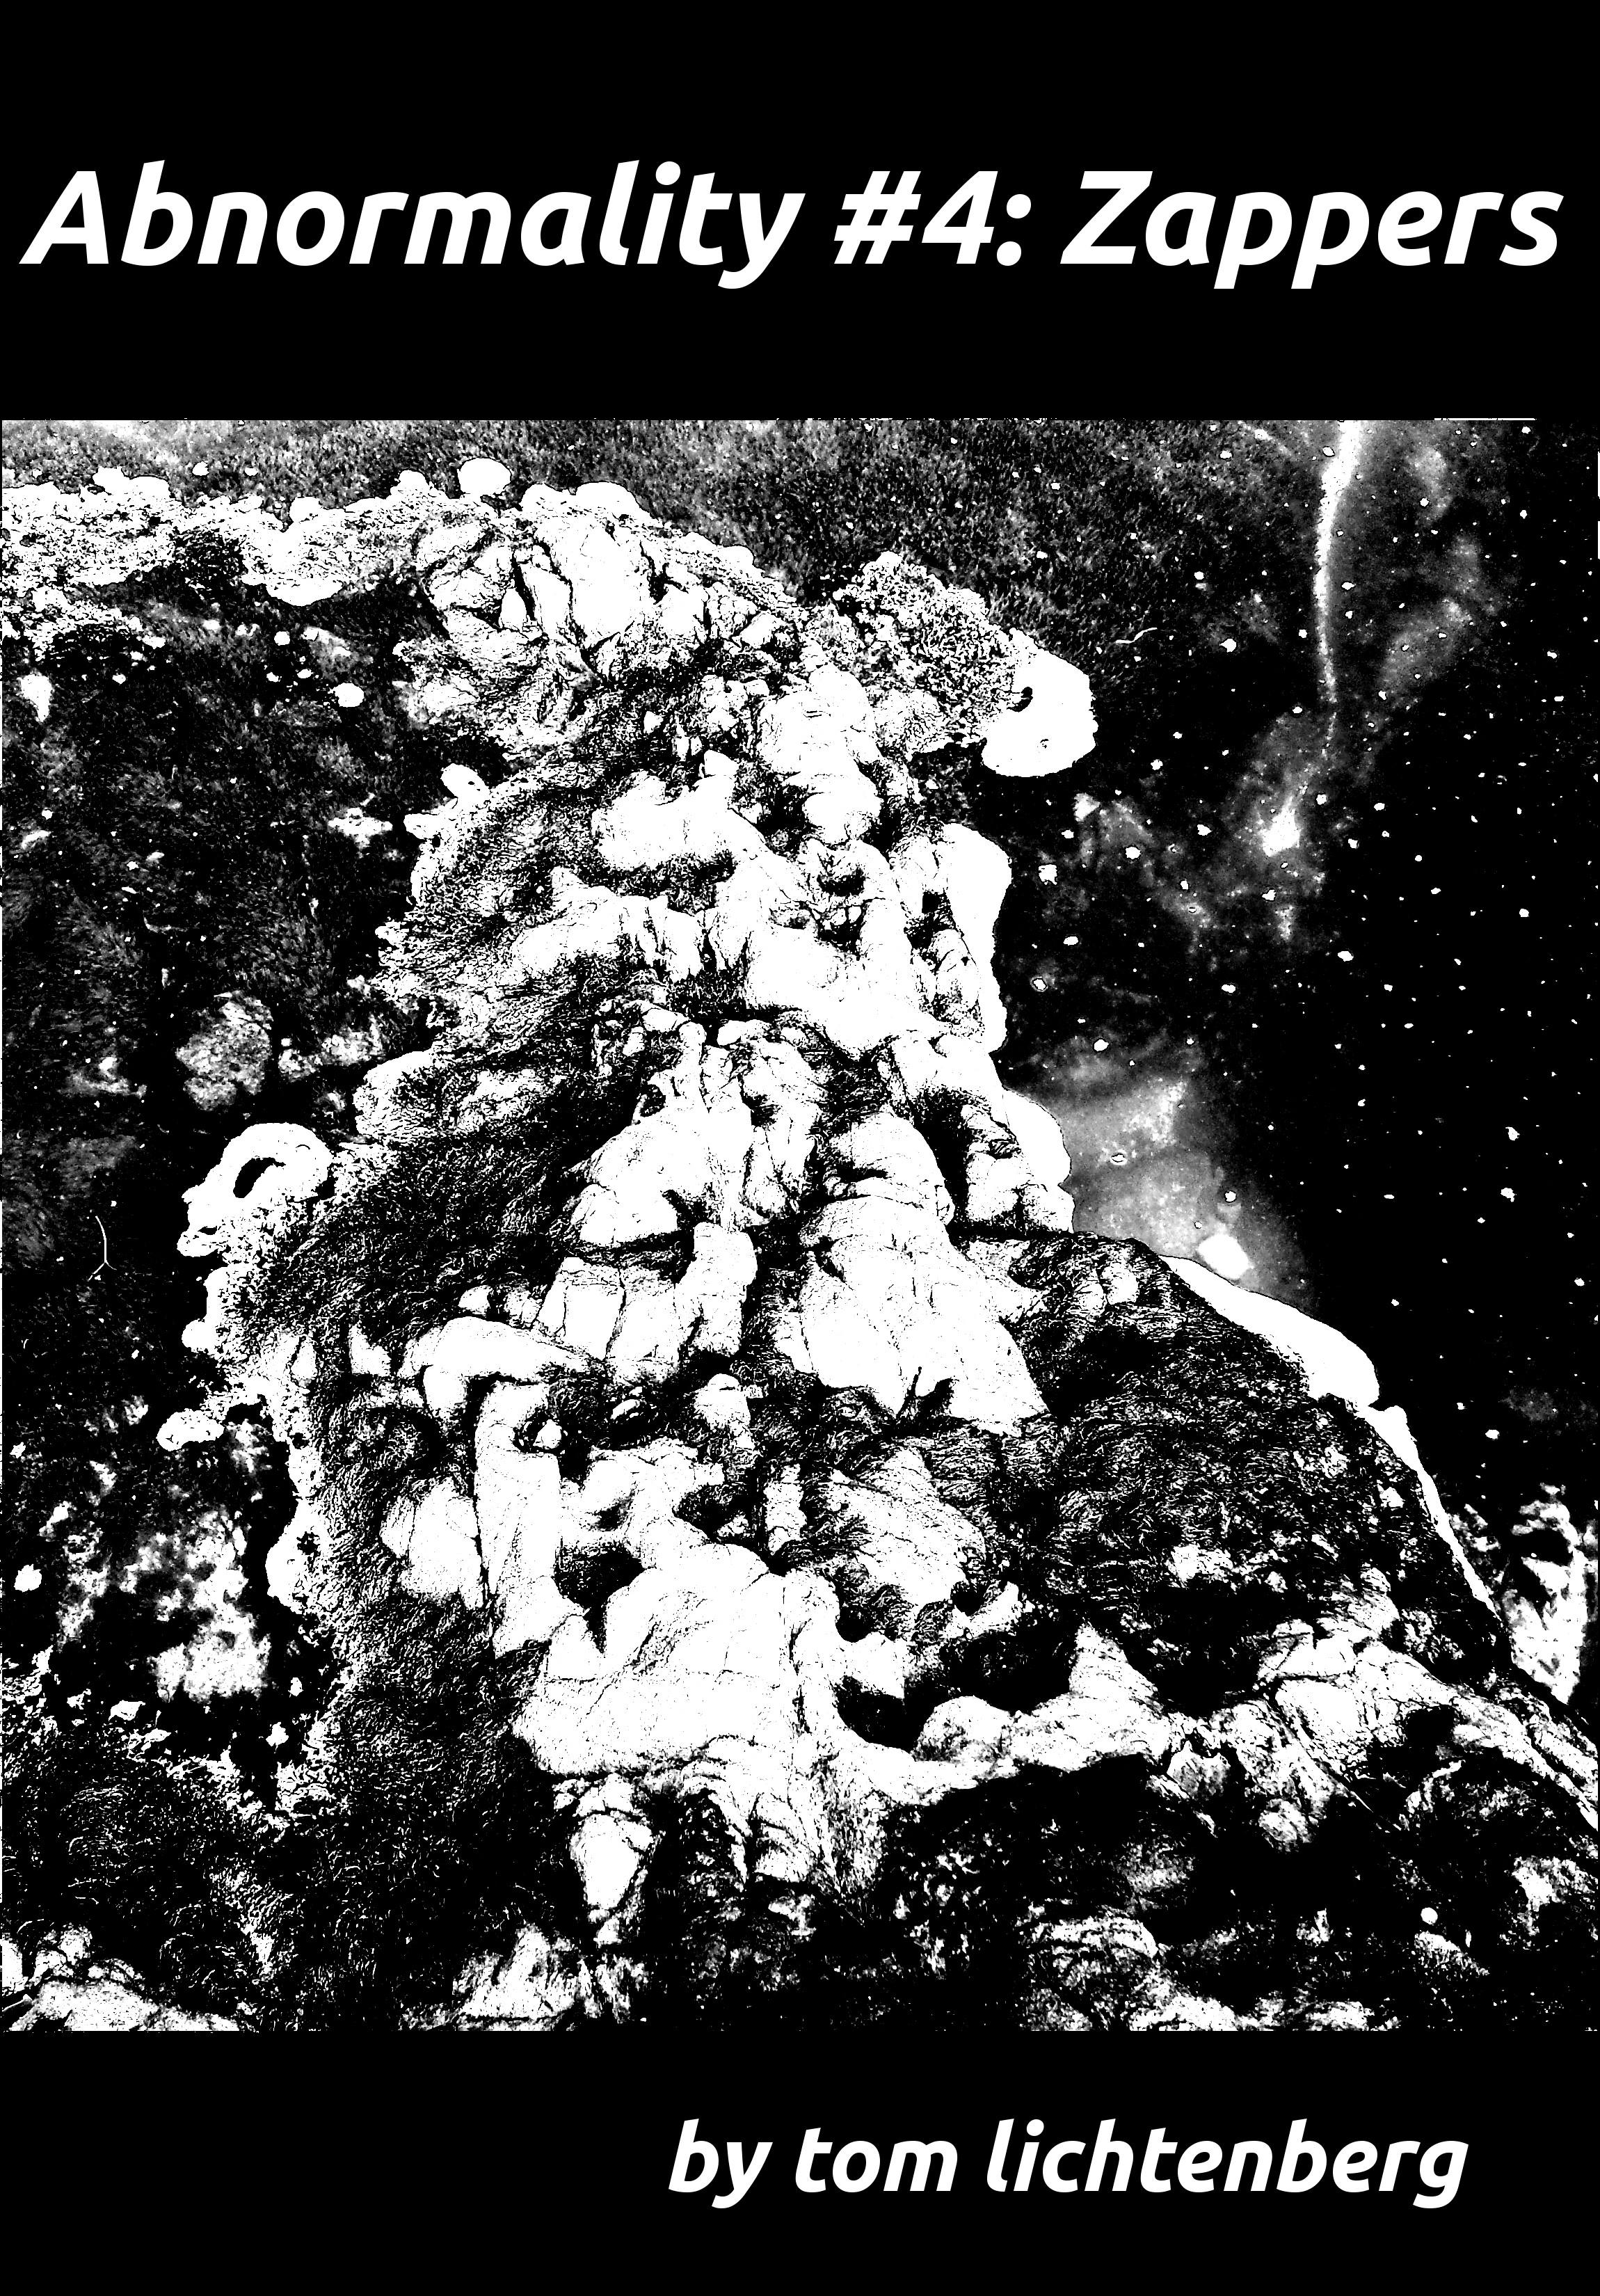 Tom Lichtenberg - Abnormality #4: Zappers